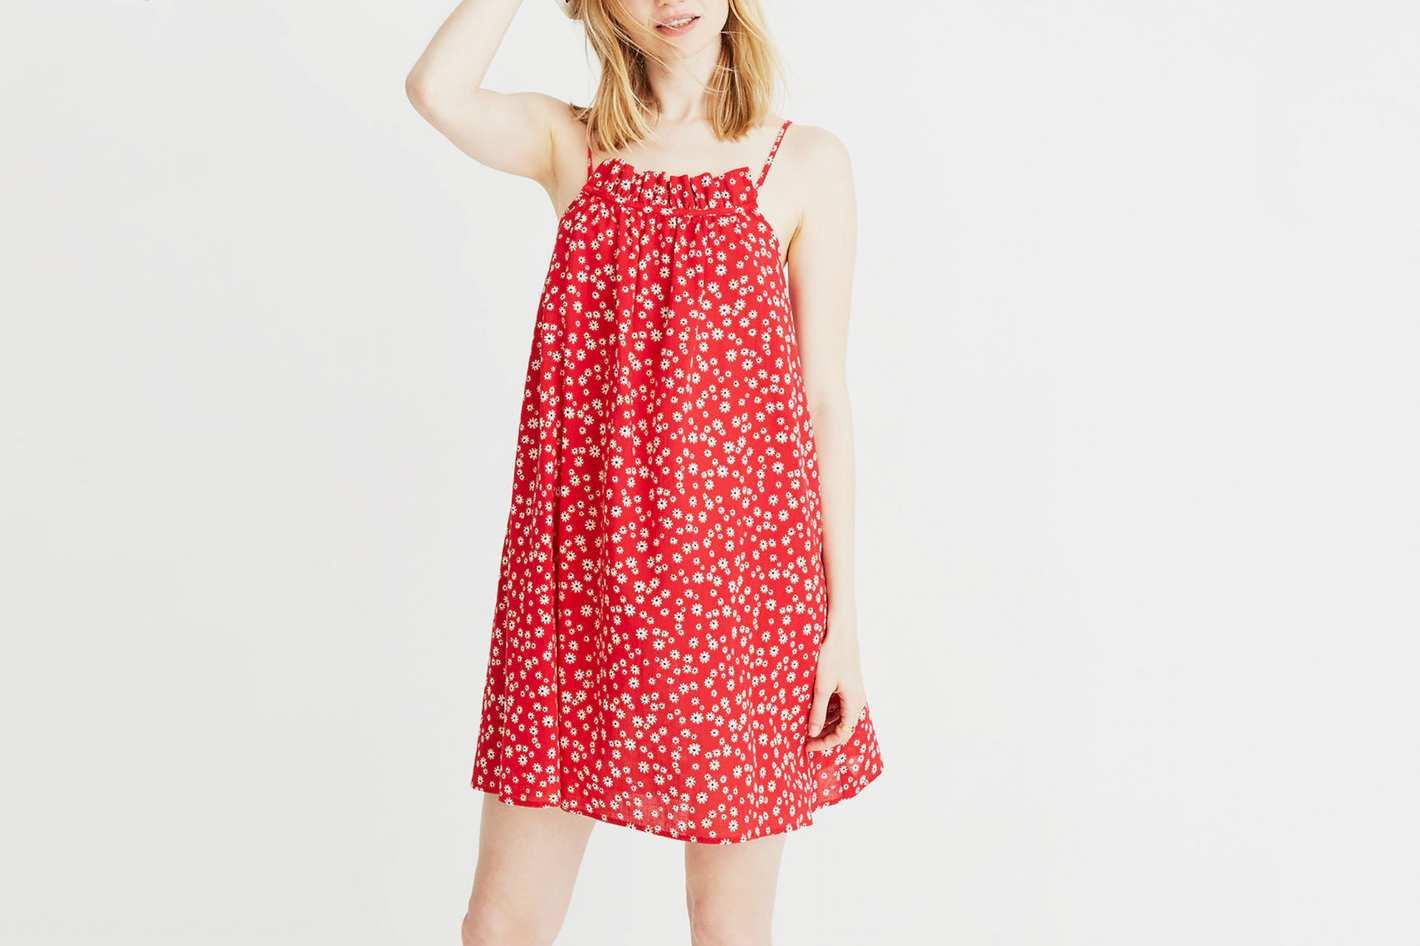 Madewell Ruffle-Neck Cover-Up Mini Dress in Daisy Field